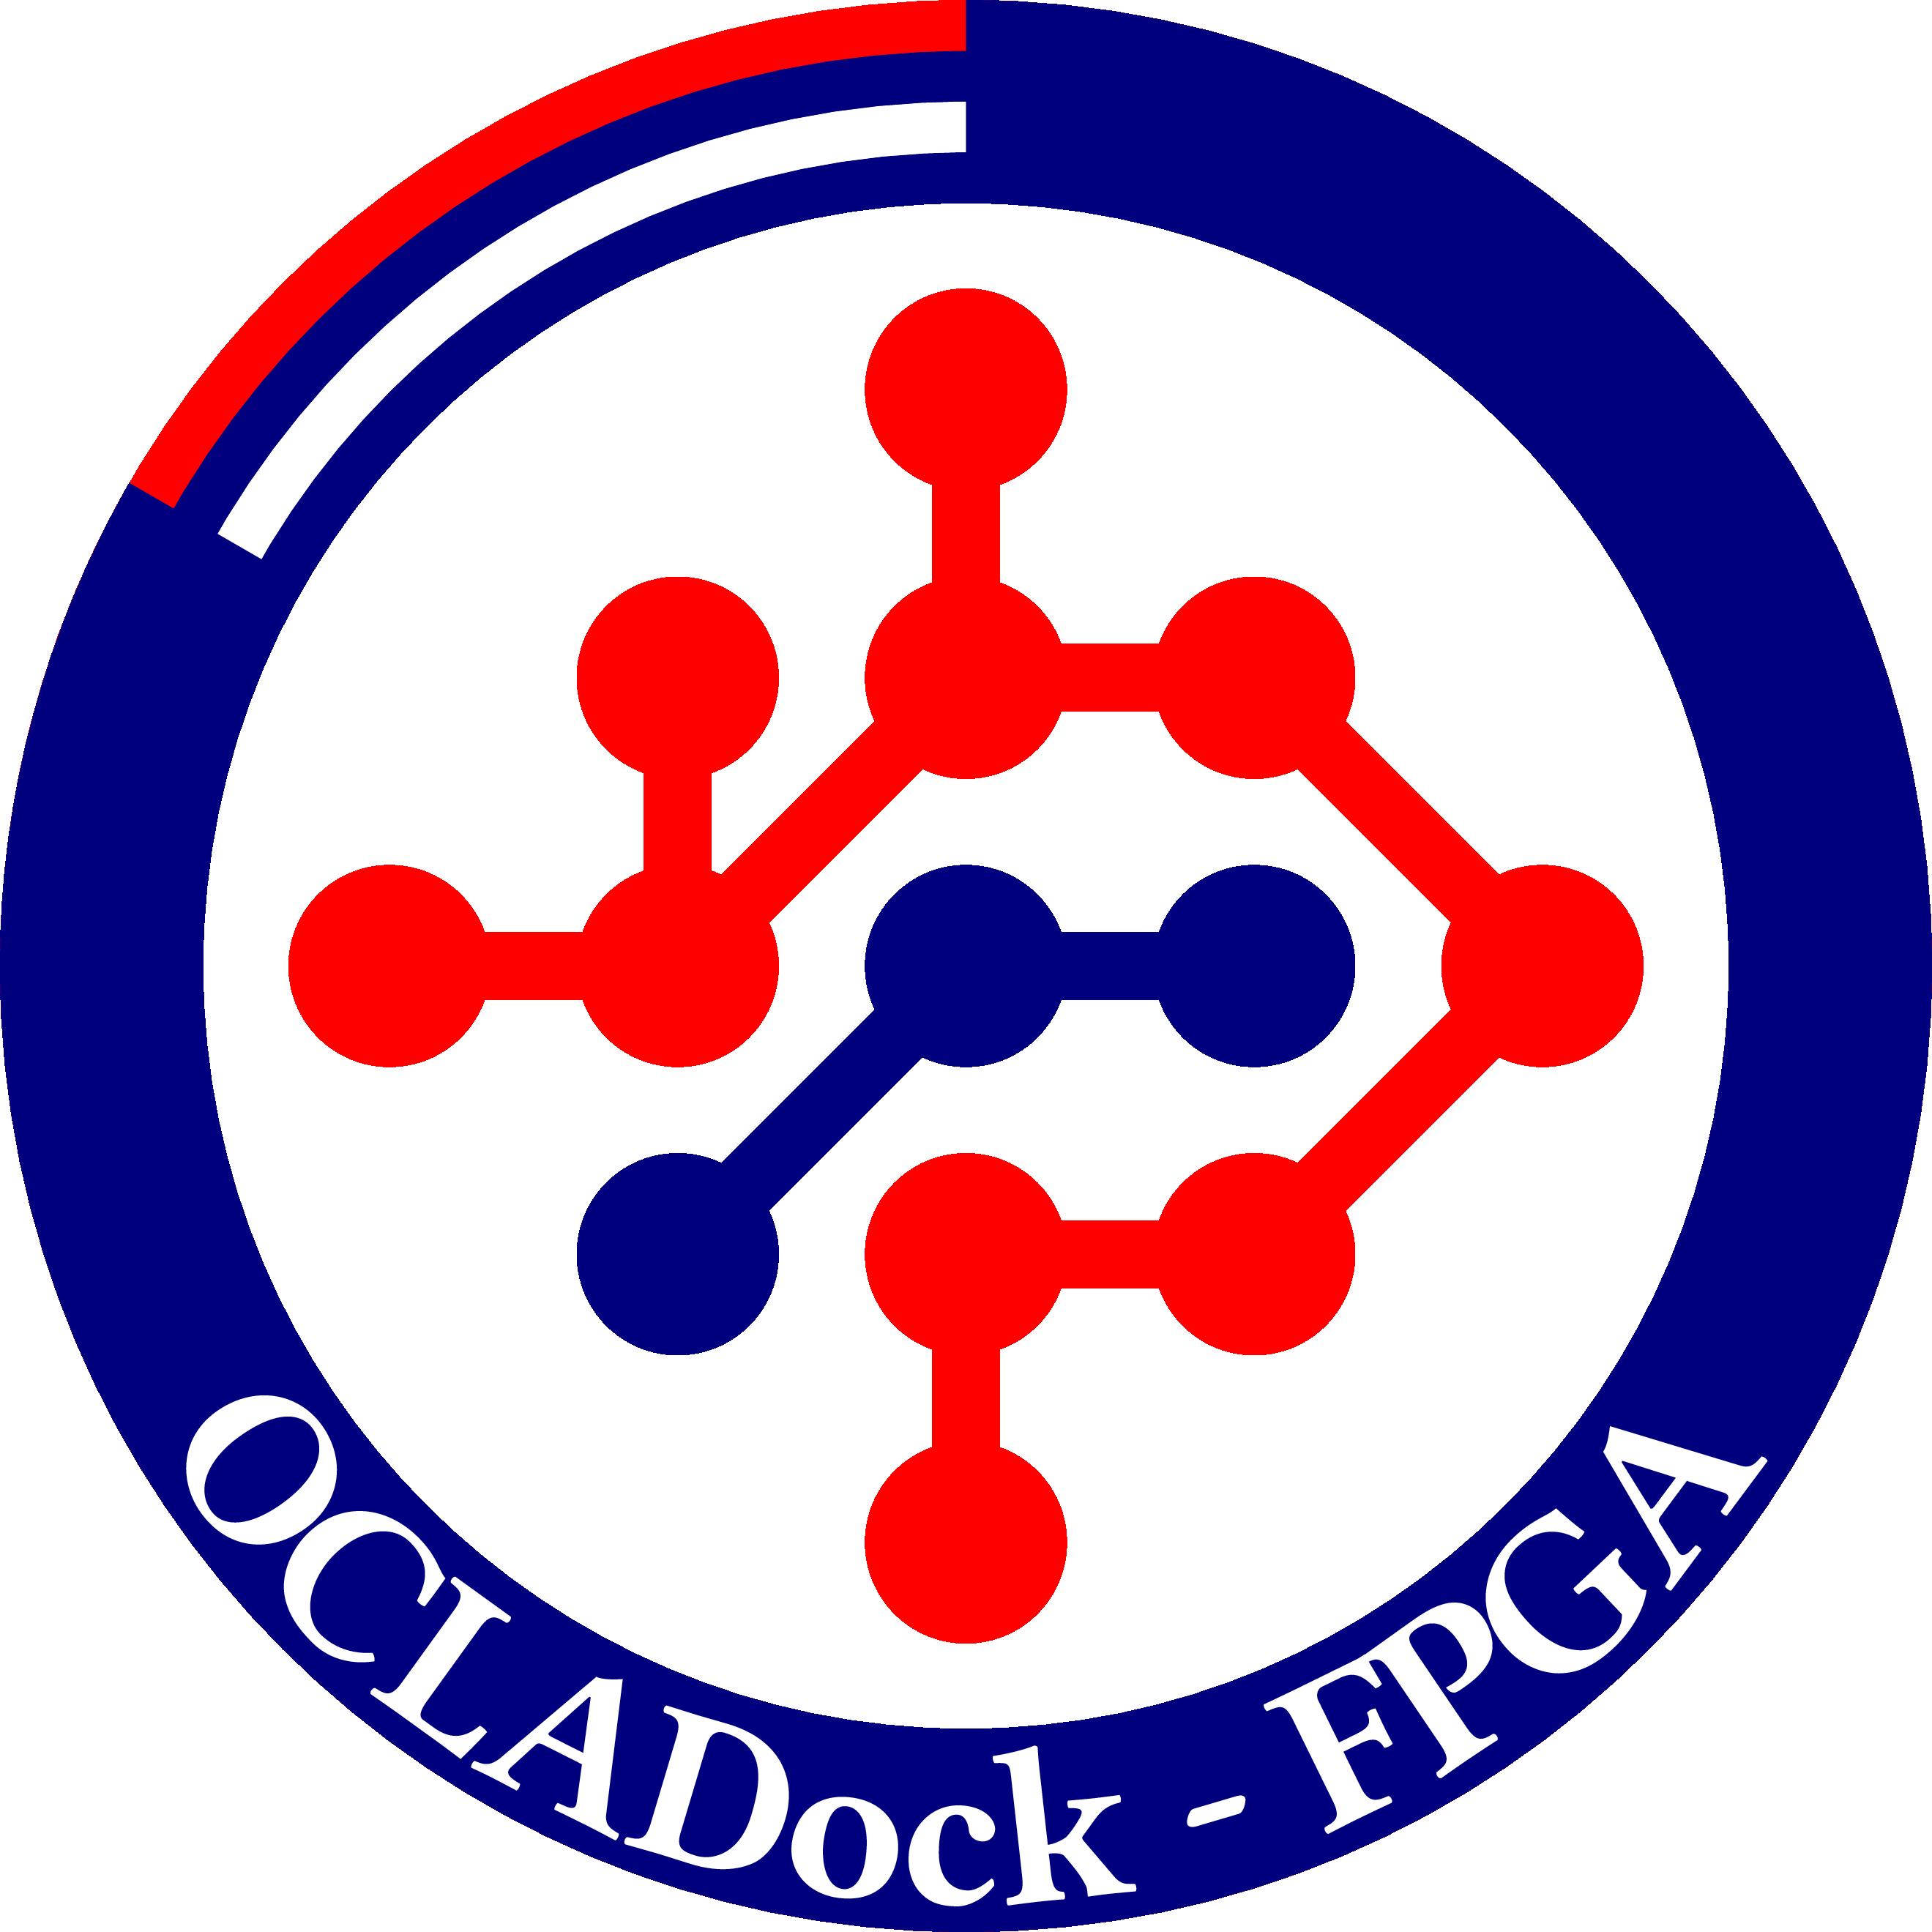 logo_ocladock.png